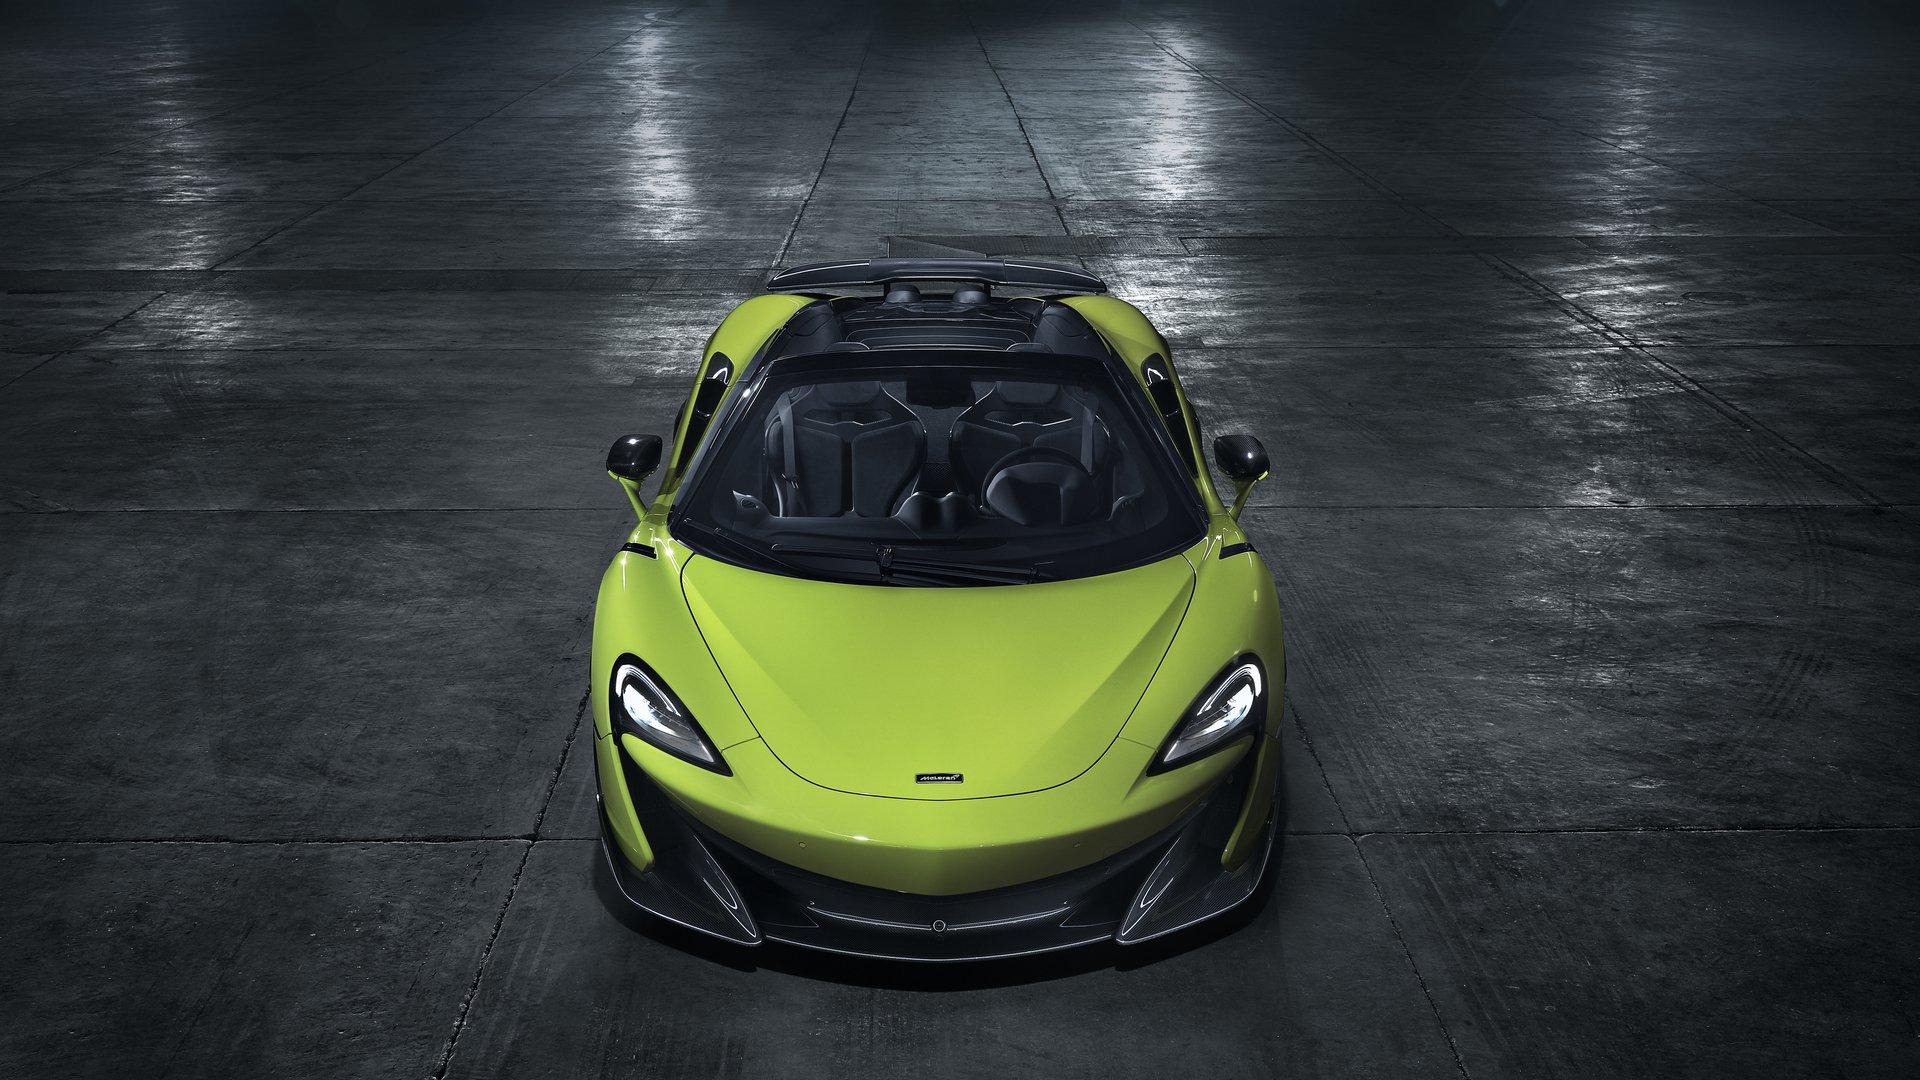 2020 McLaren 600 LT Spider